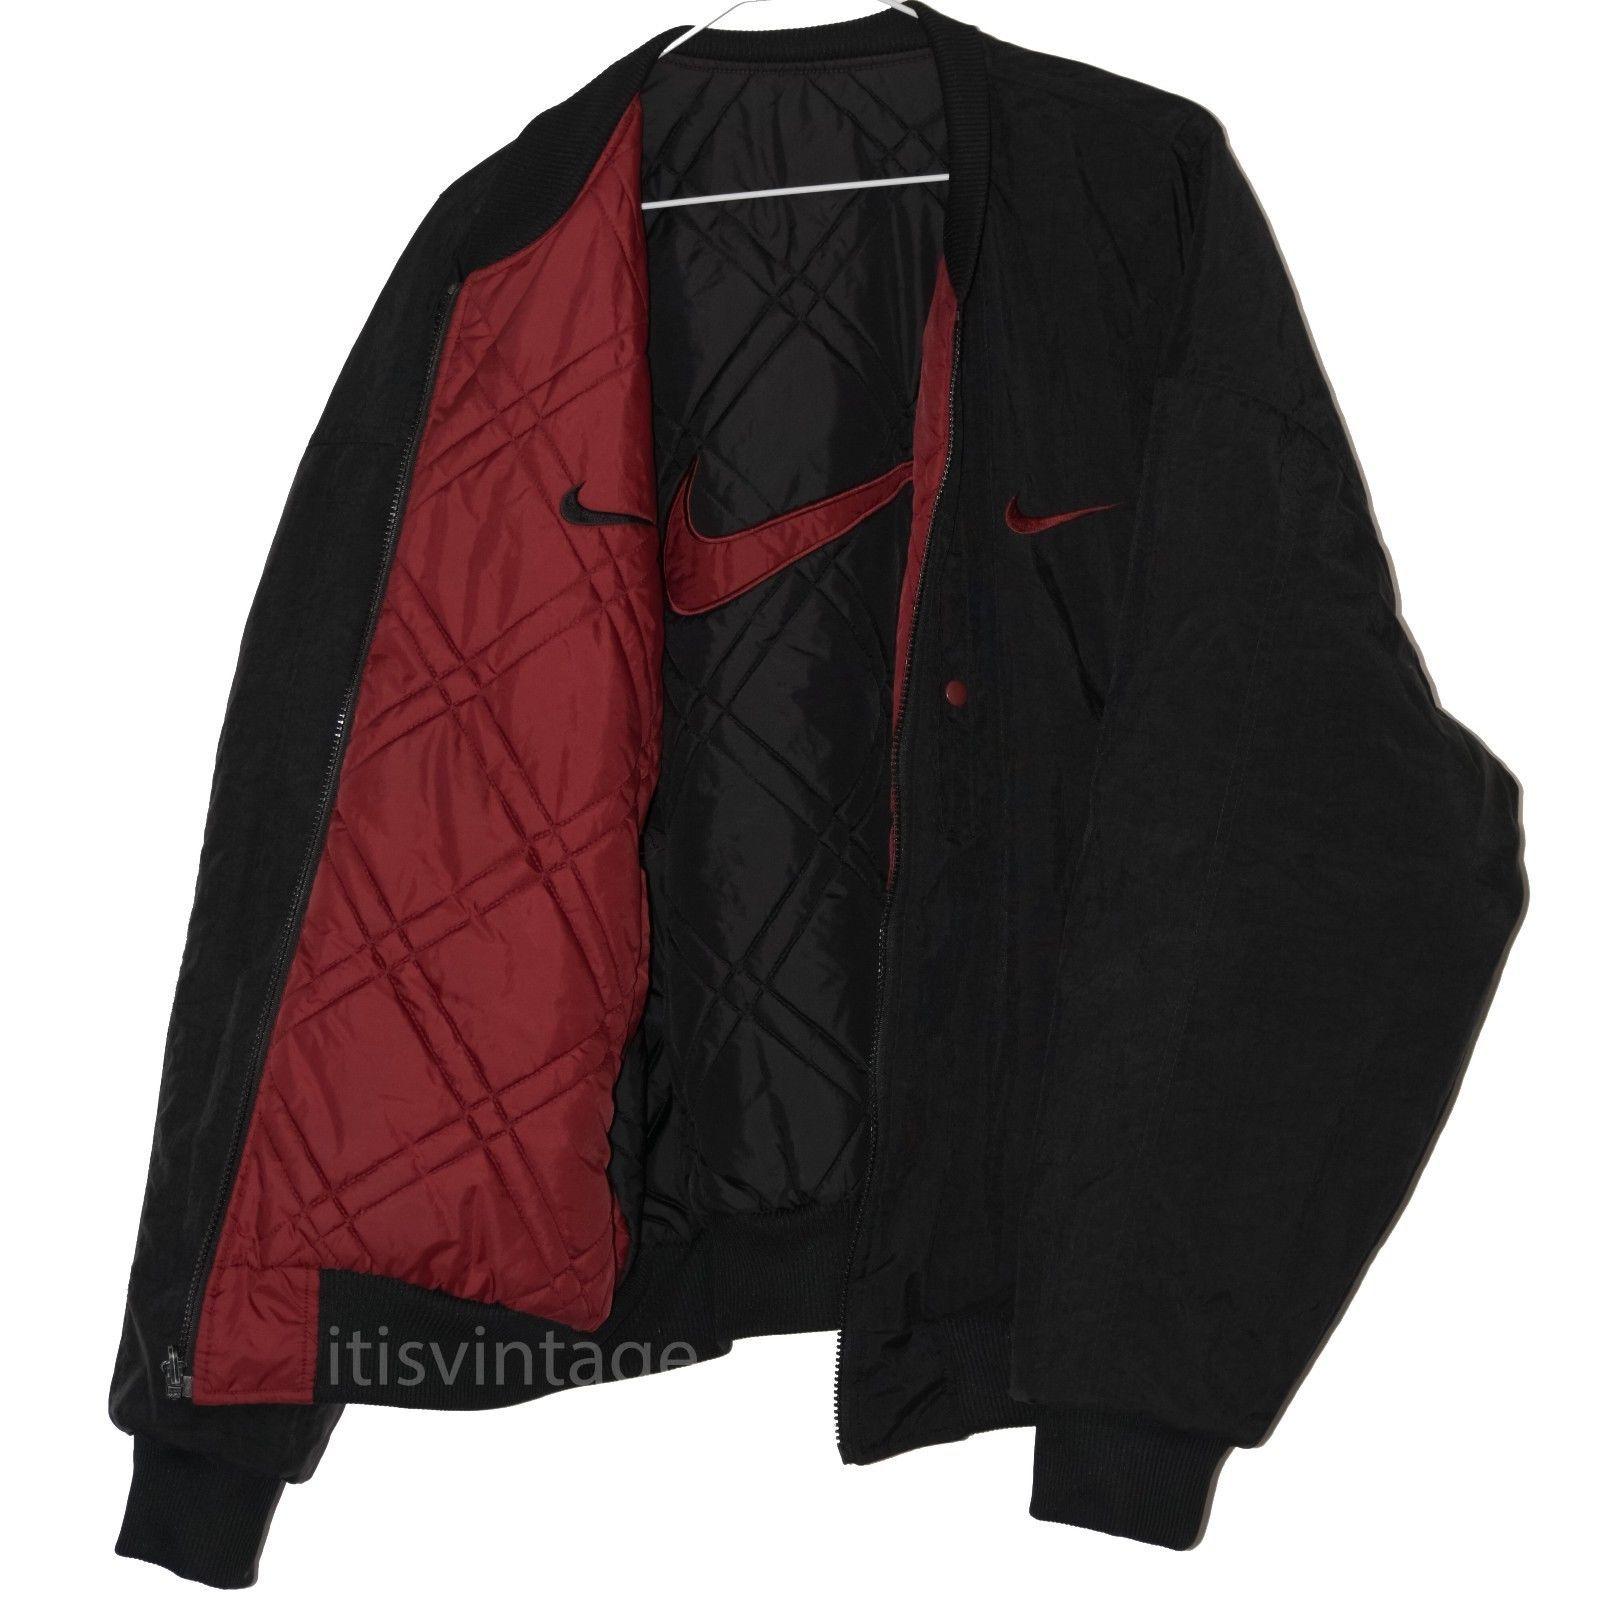 907d492726b2 Reversible Vintage Nike Full Zip Large Swoosh Insulated Nylon Bomber Jacket  Coat